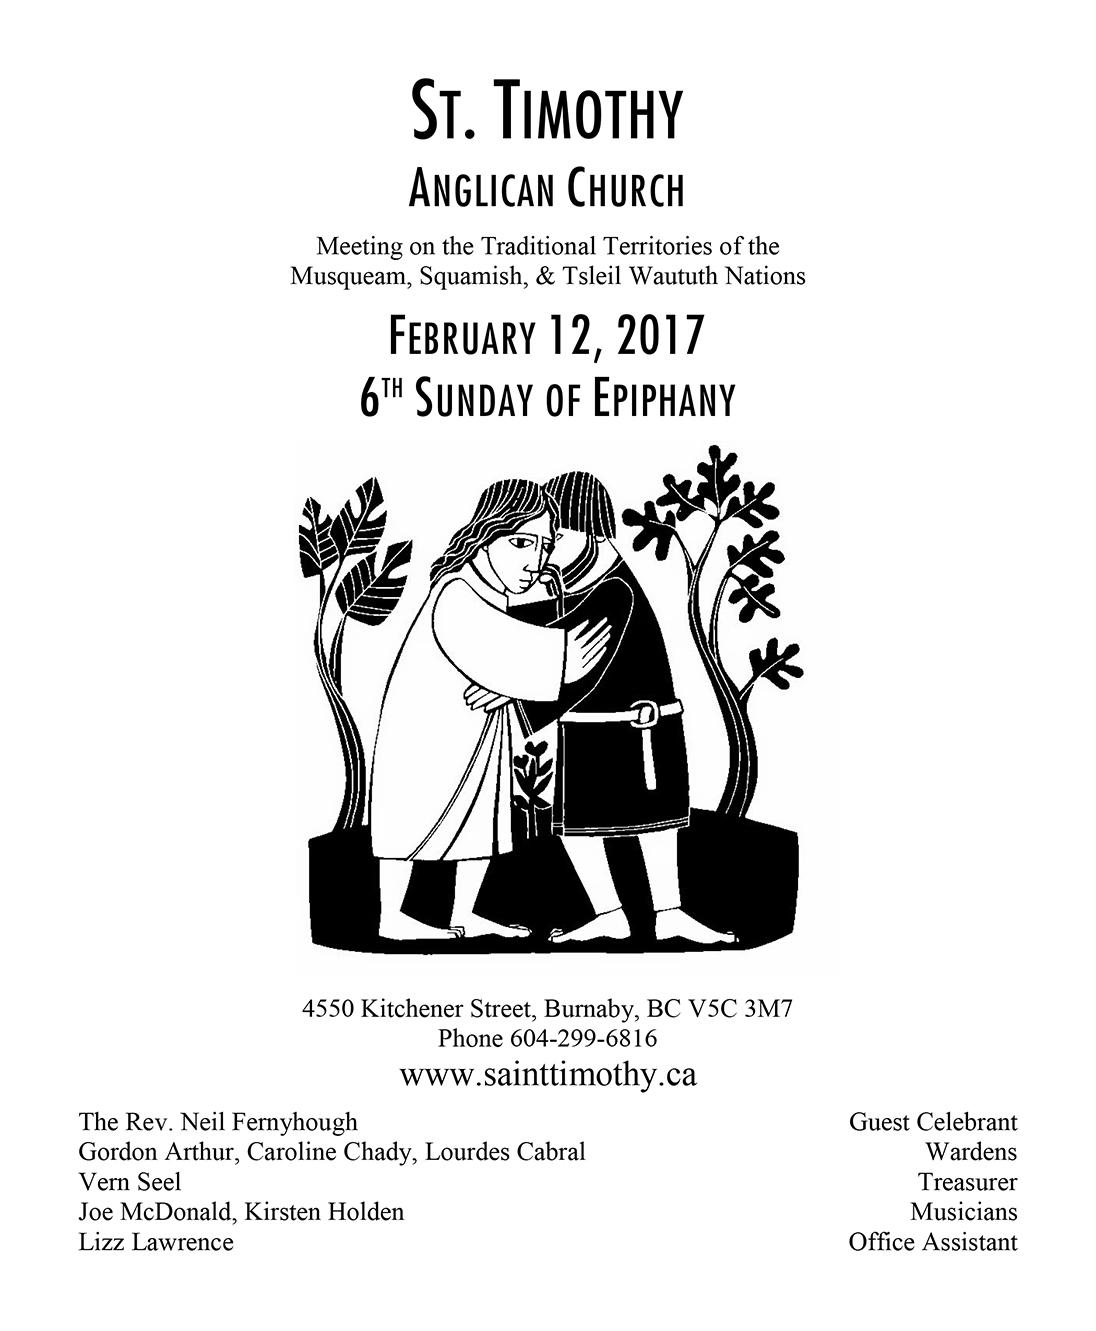 Bulletin: February 12, 2017